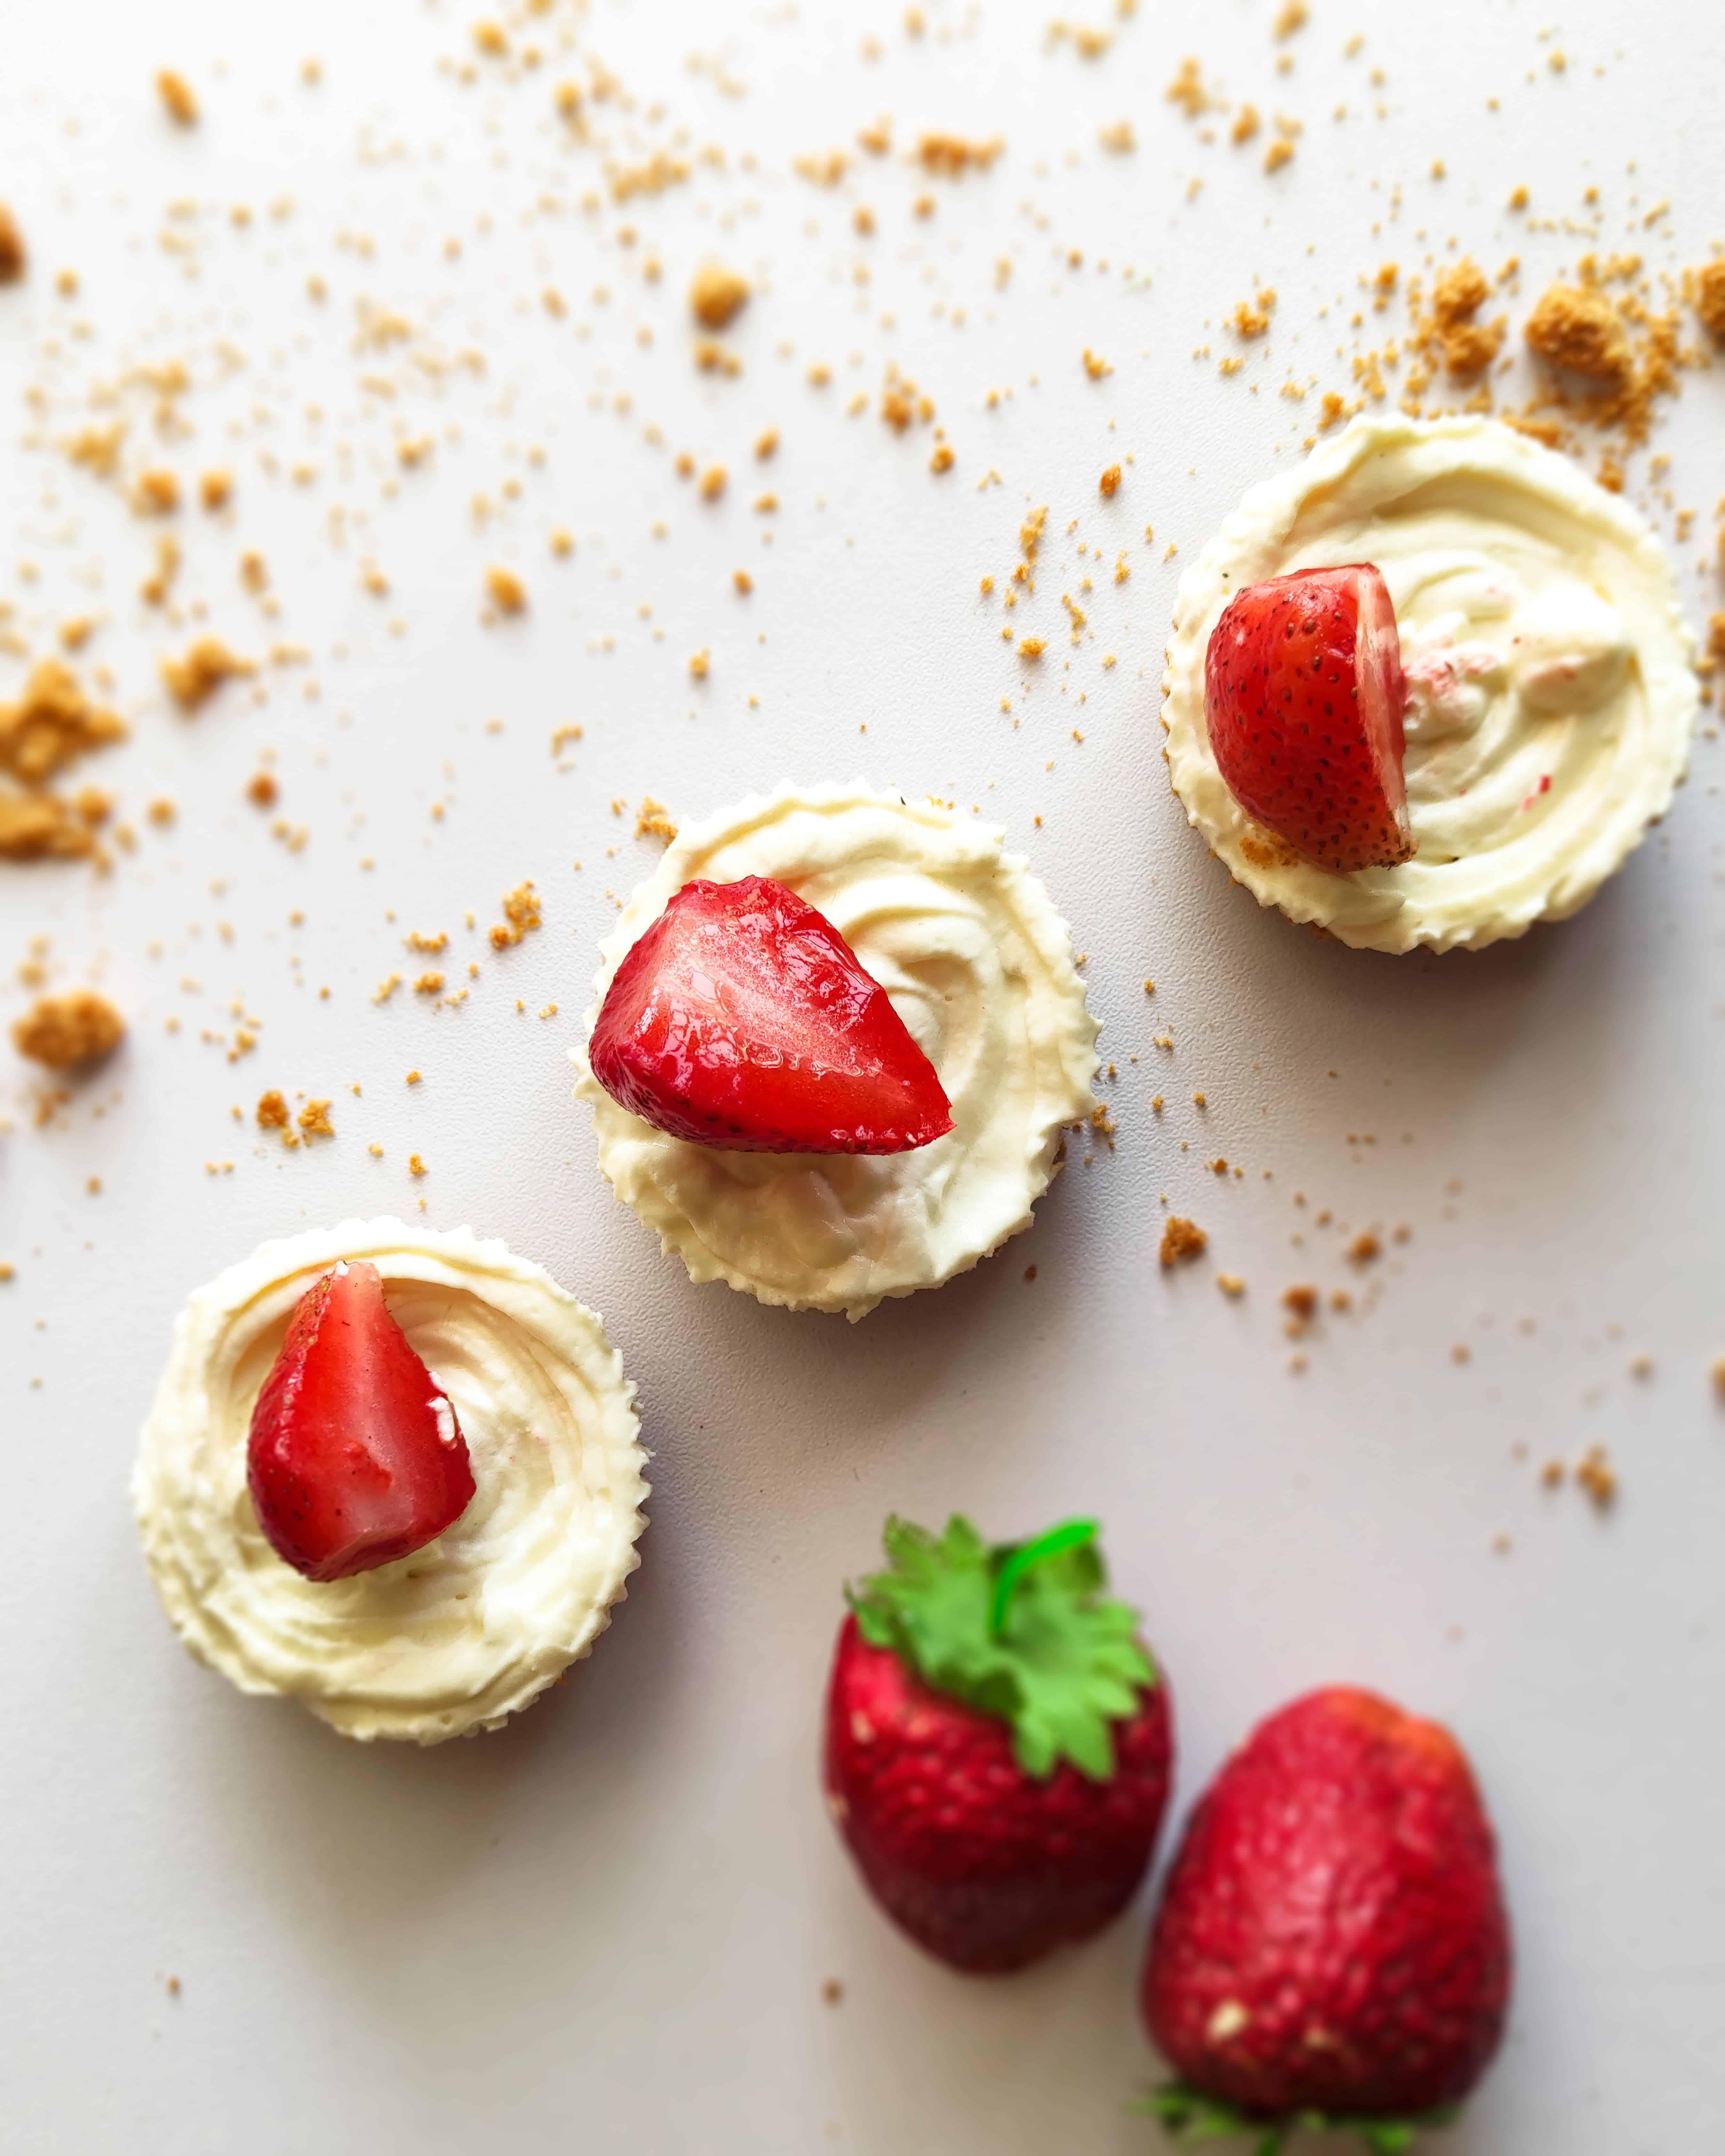 keto-strawberry-cheesecake-bites-overhead-shot